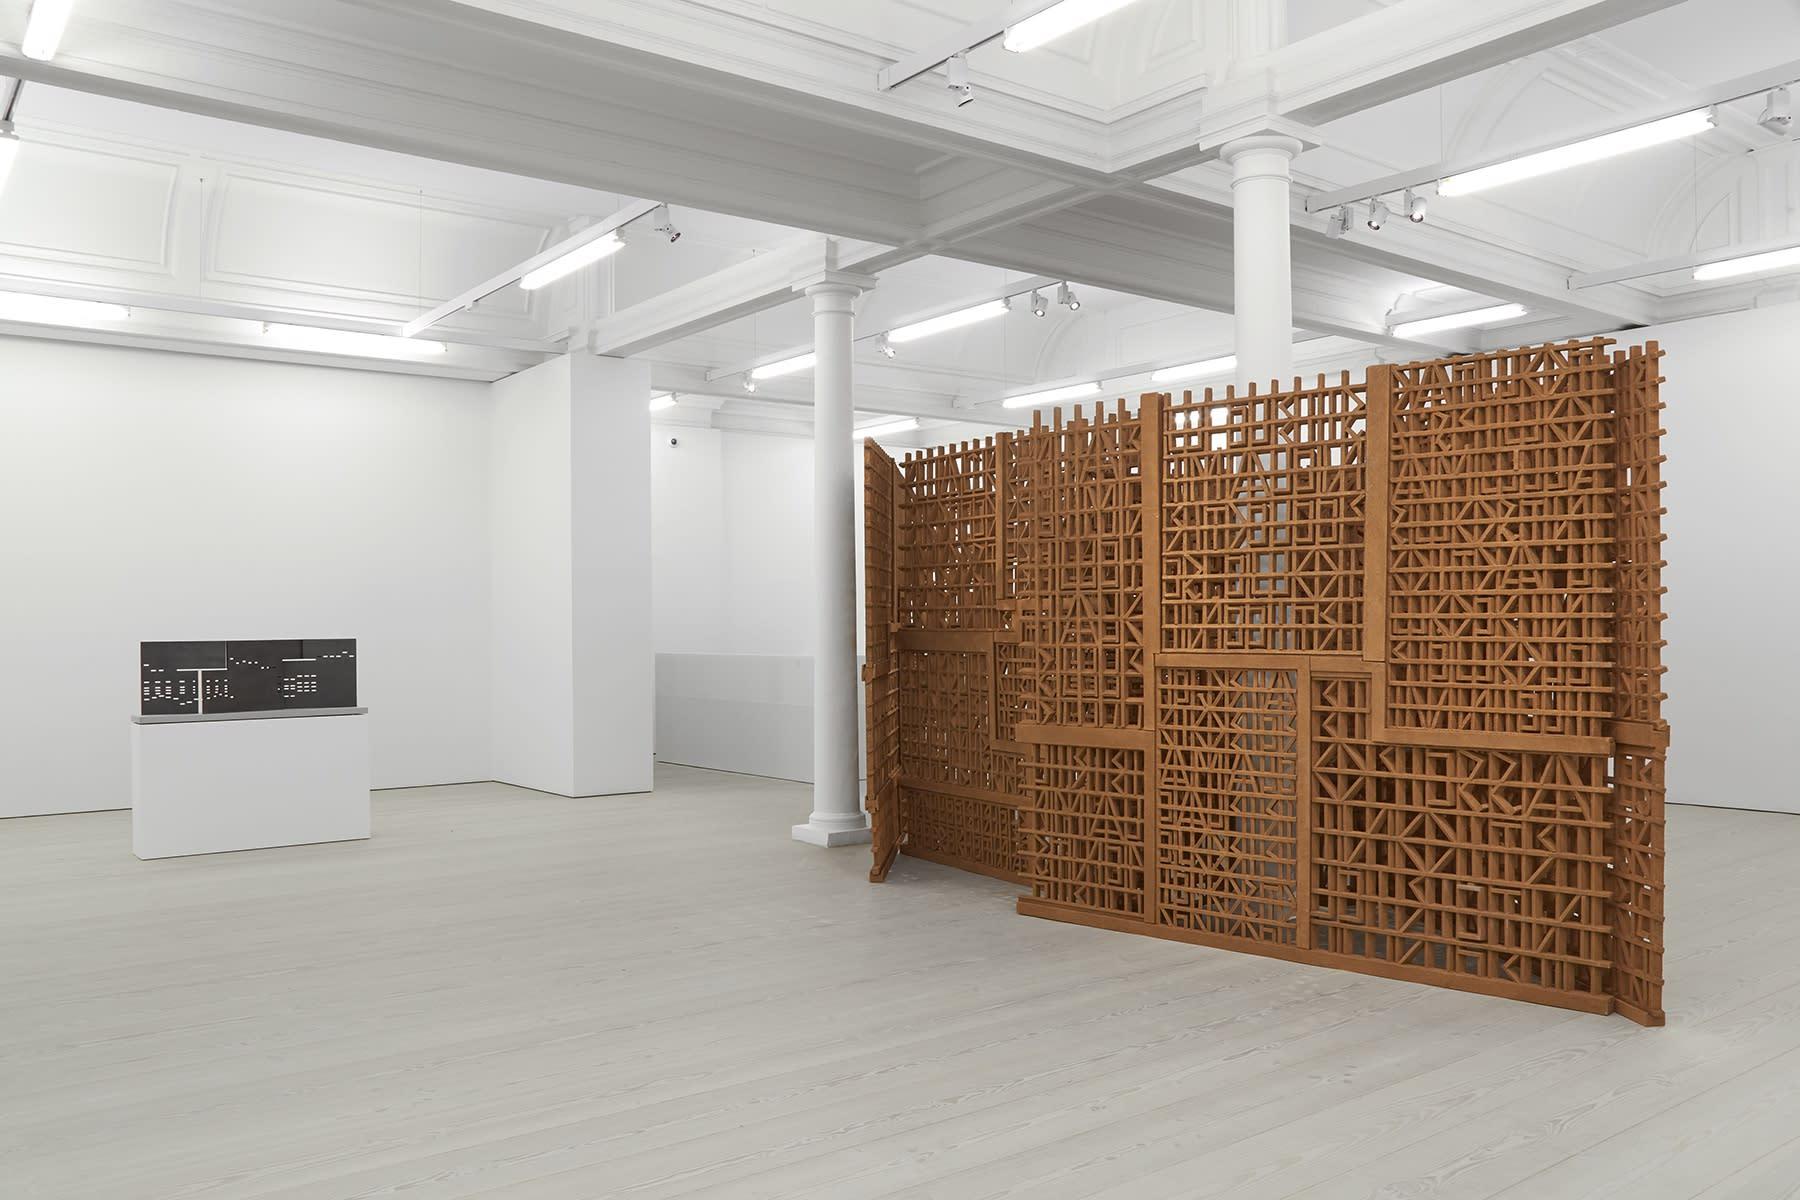 A Cristina Iglesias artwork spans the middle of the room around 2 white columns.